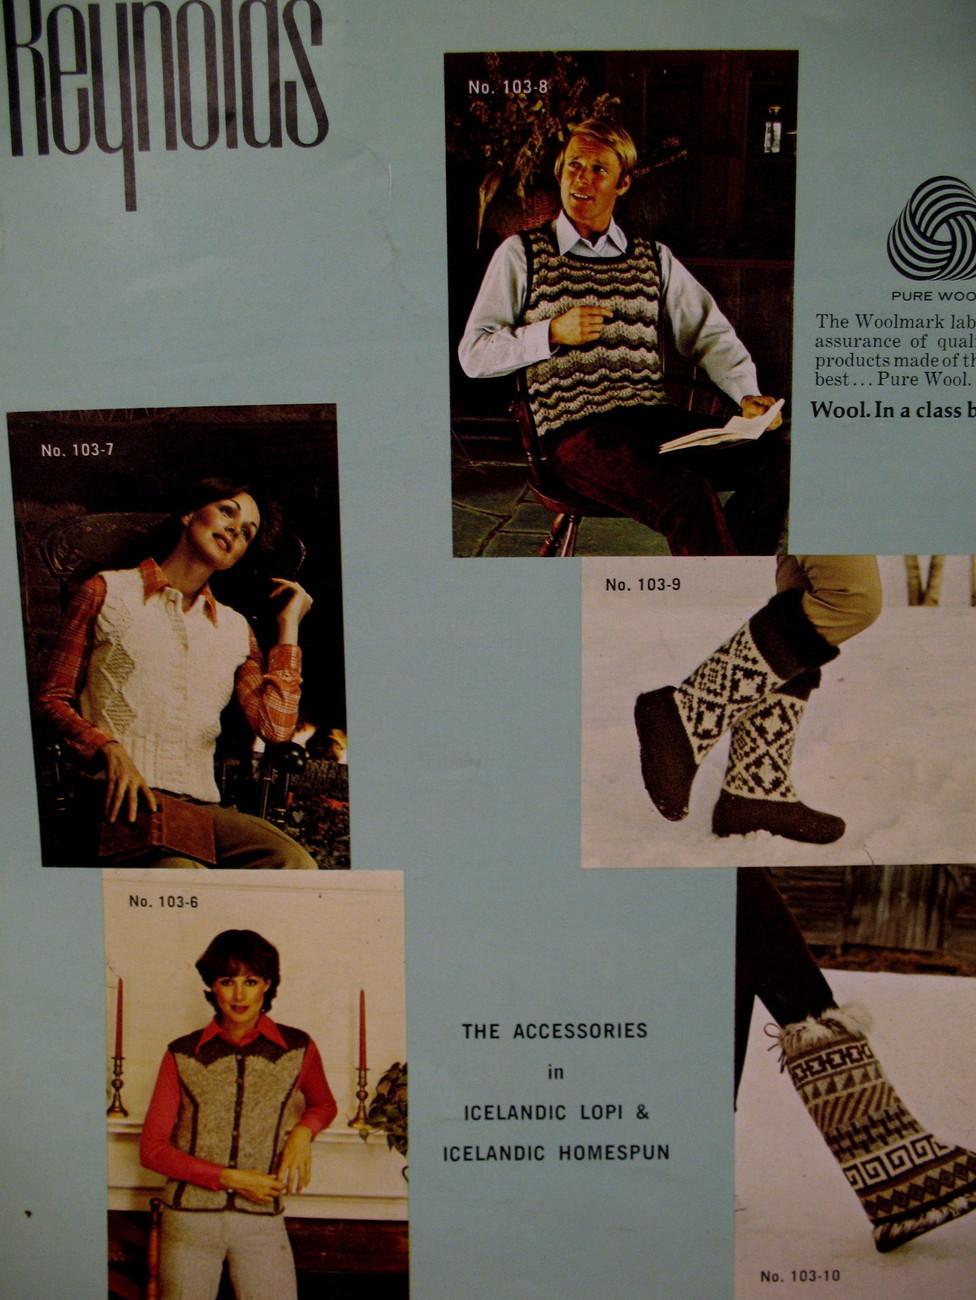 Reynolds Icelandic Lopi Caps Vests Boots Knitting Pattern